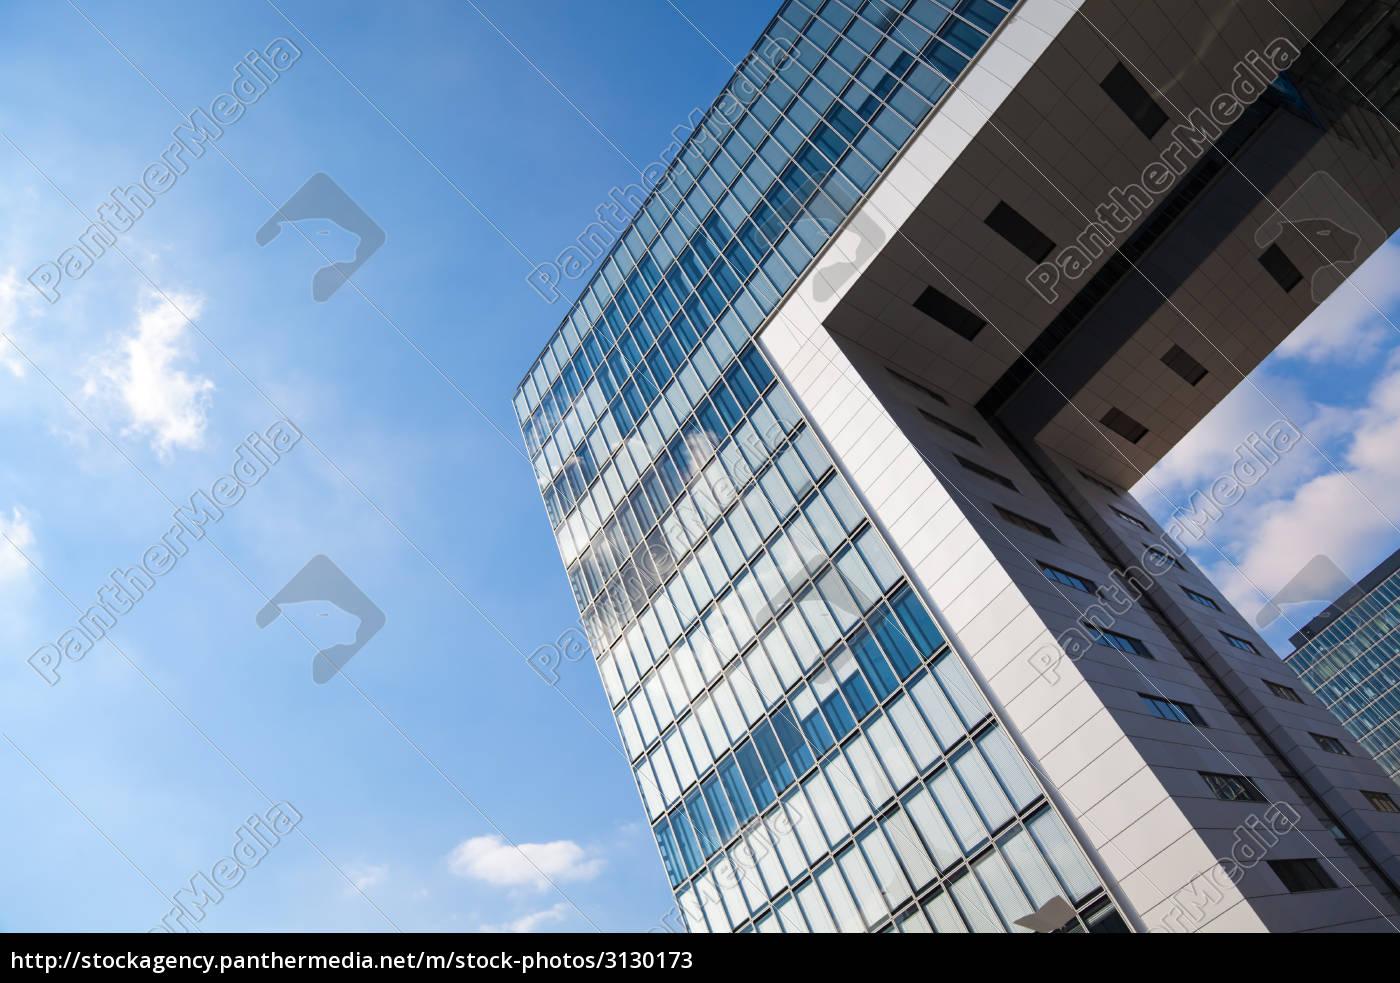 Stockfoto 3130173   Moderne Architektur In Köln